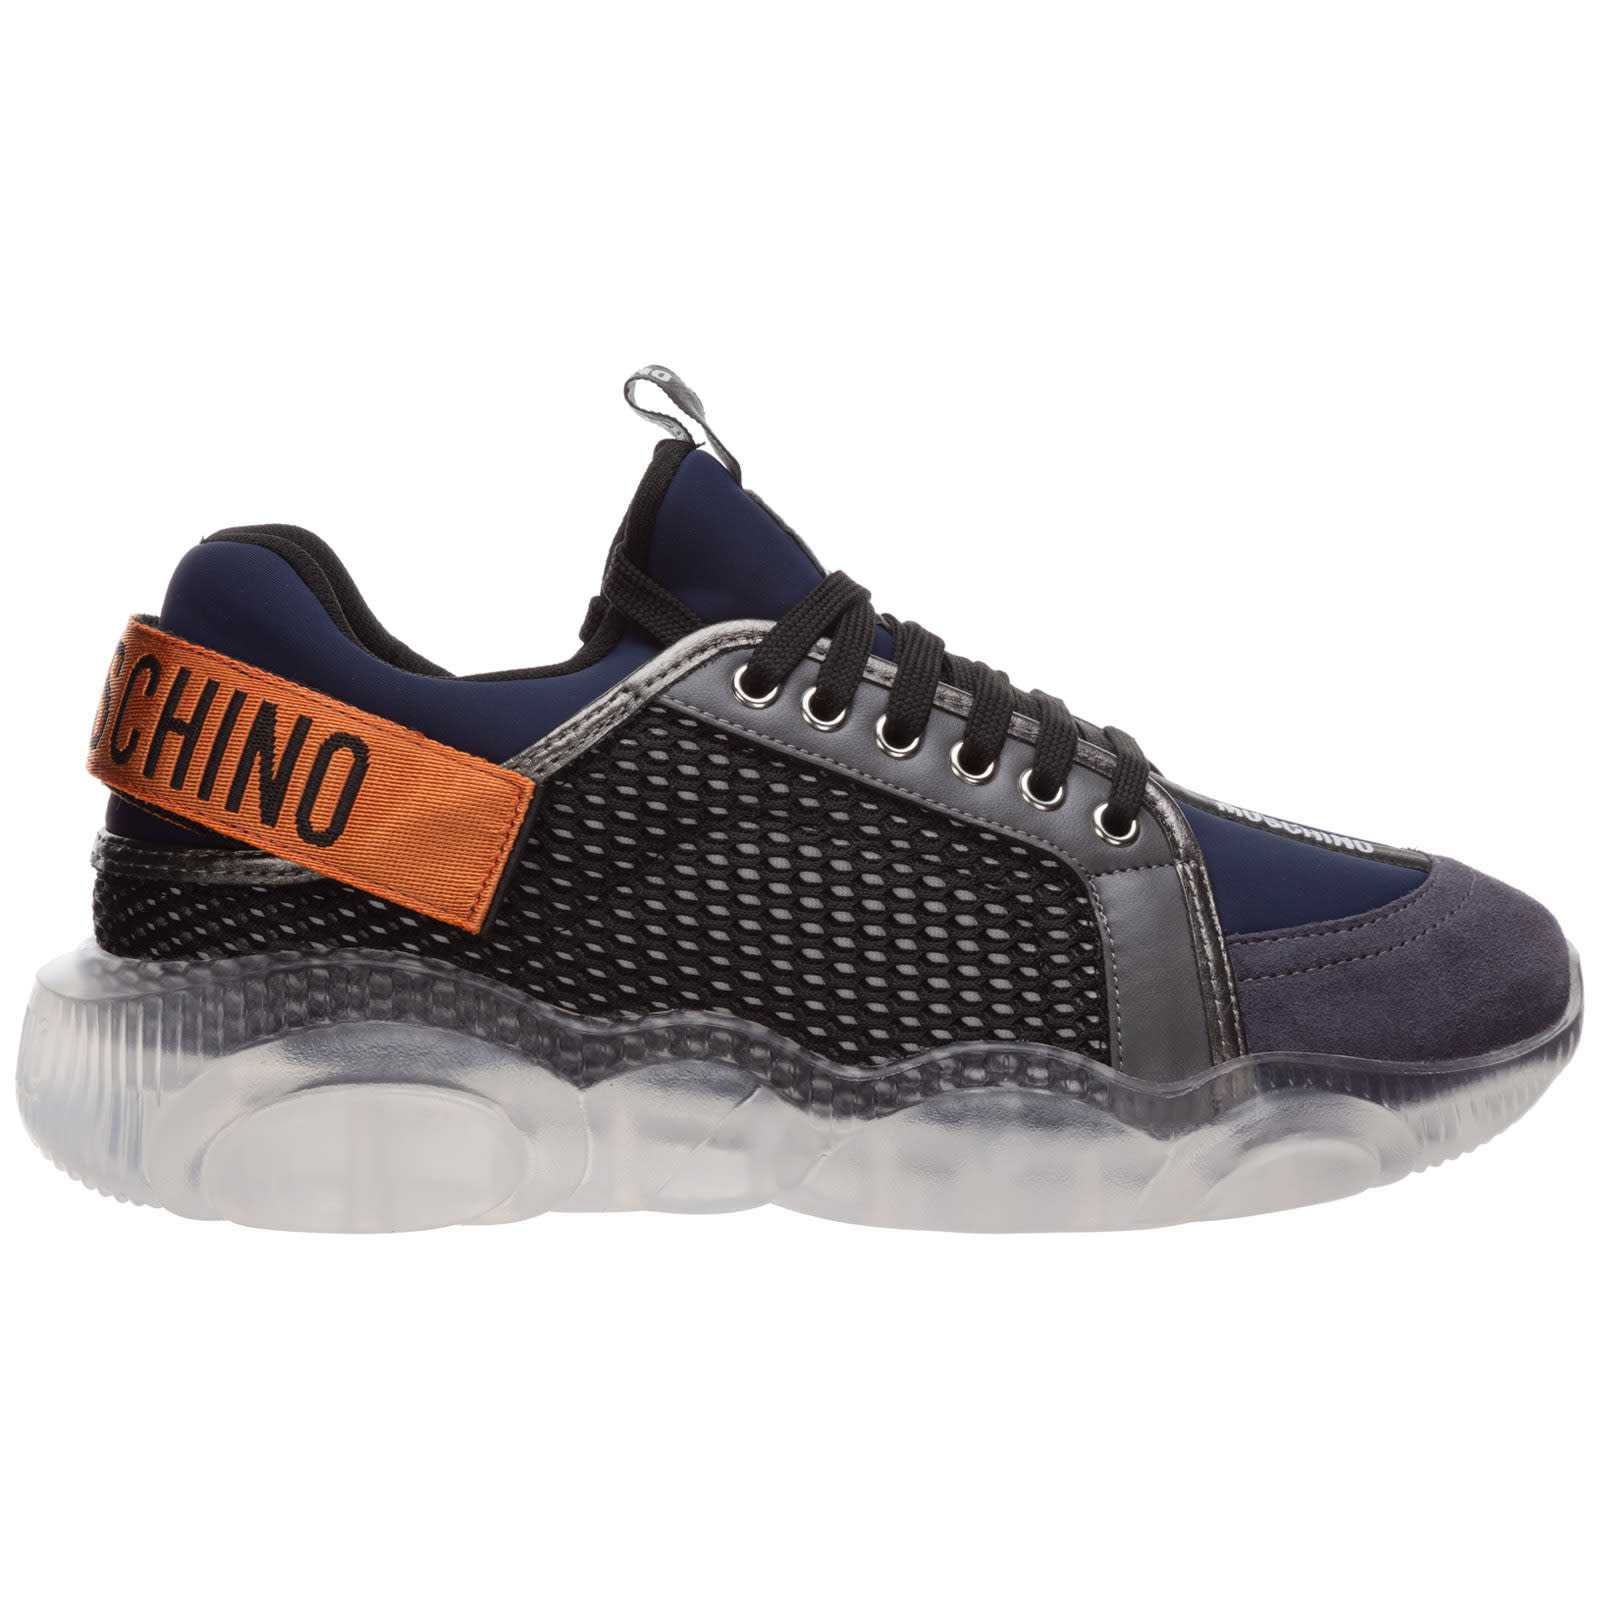 Moschino Activewears ORSO SNEAKERS